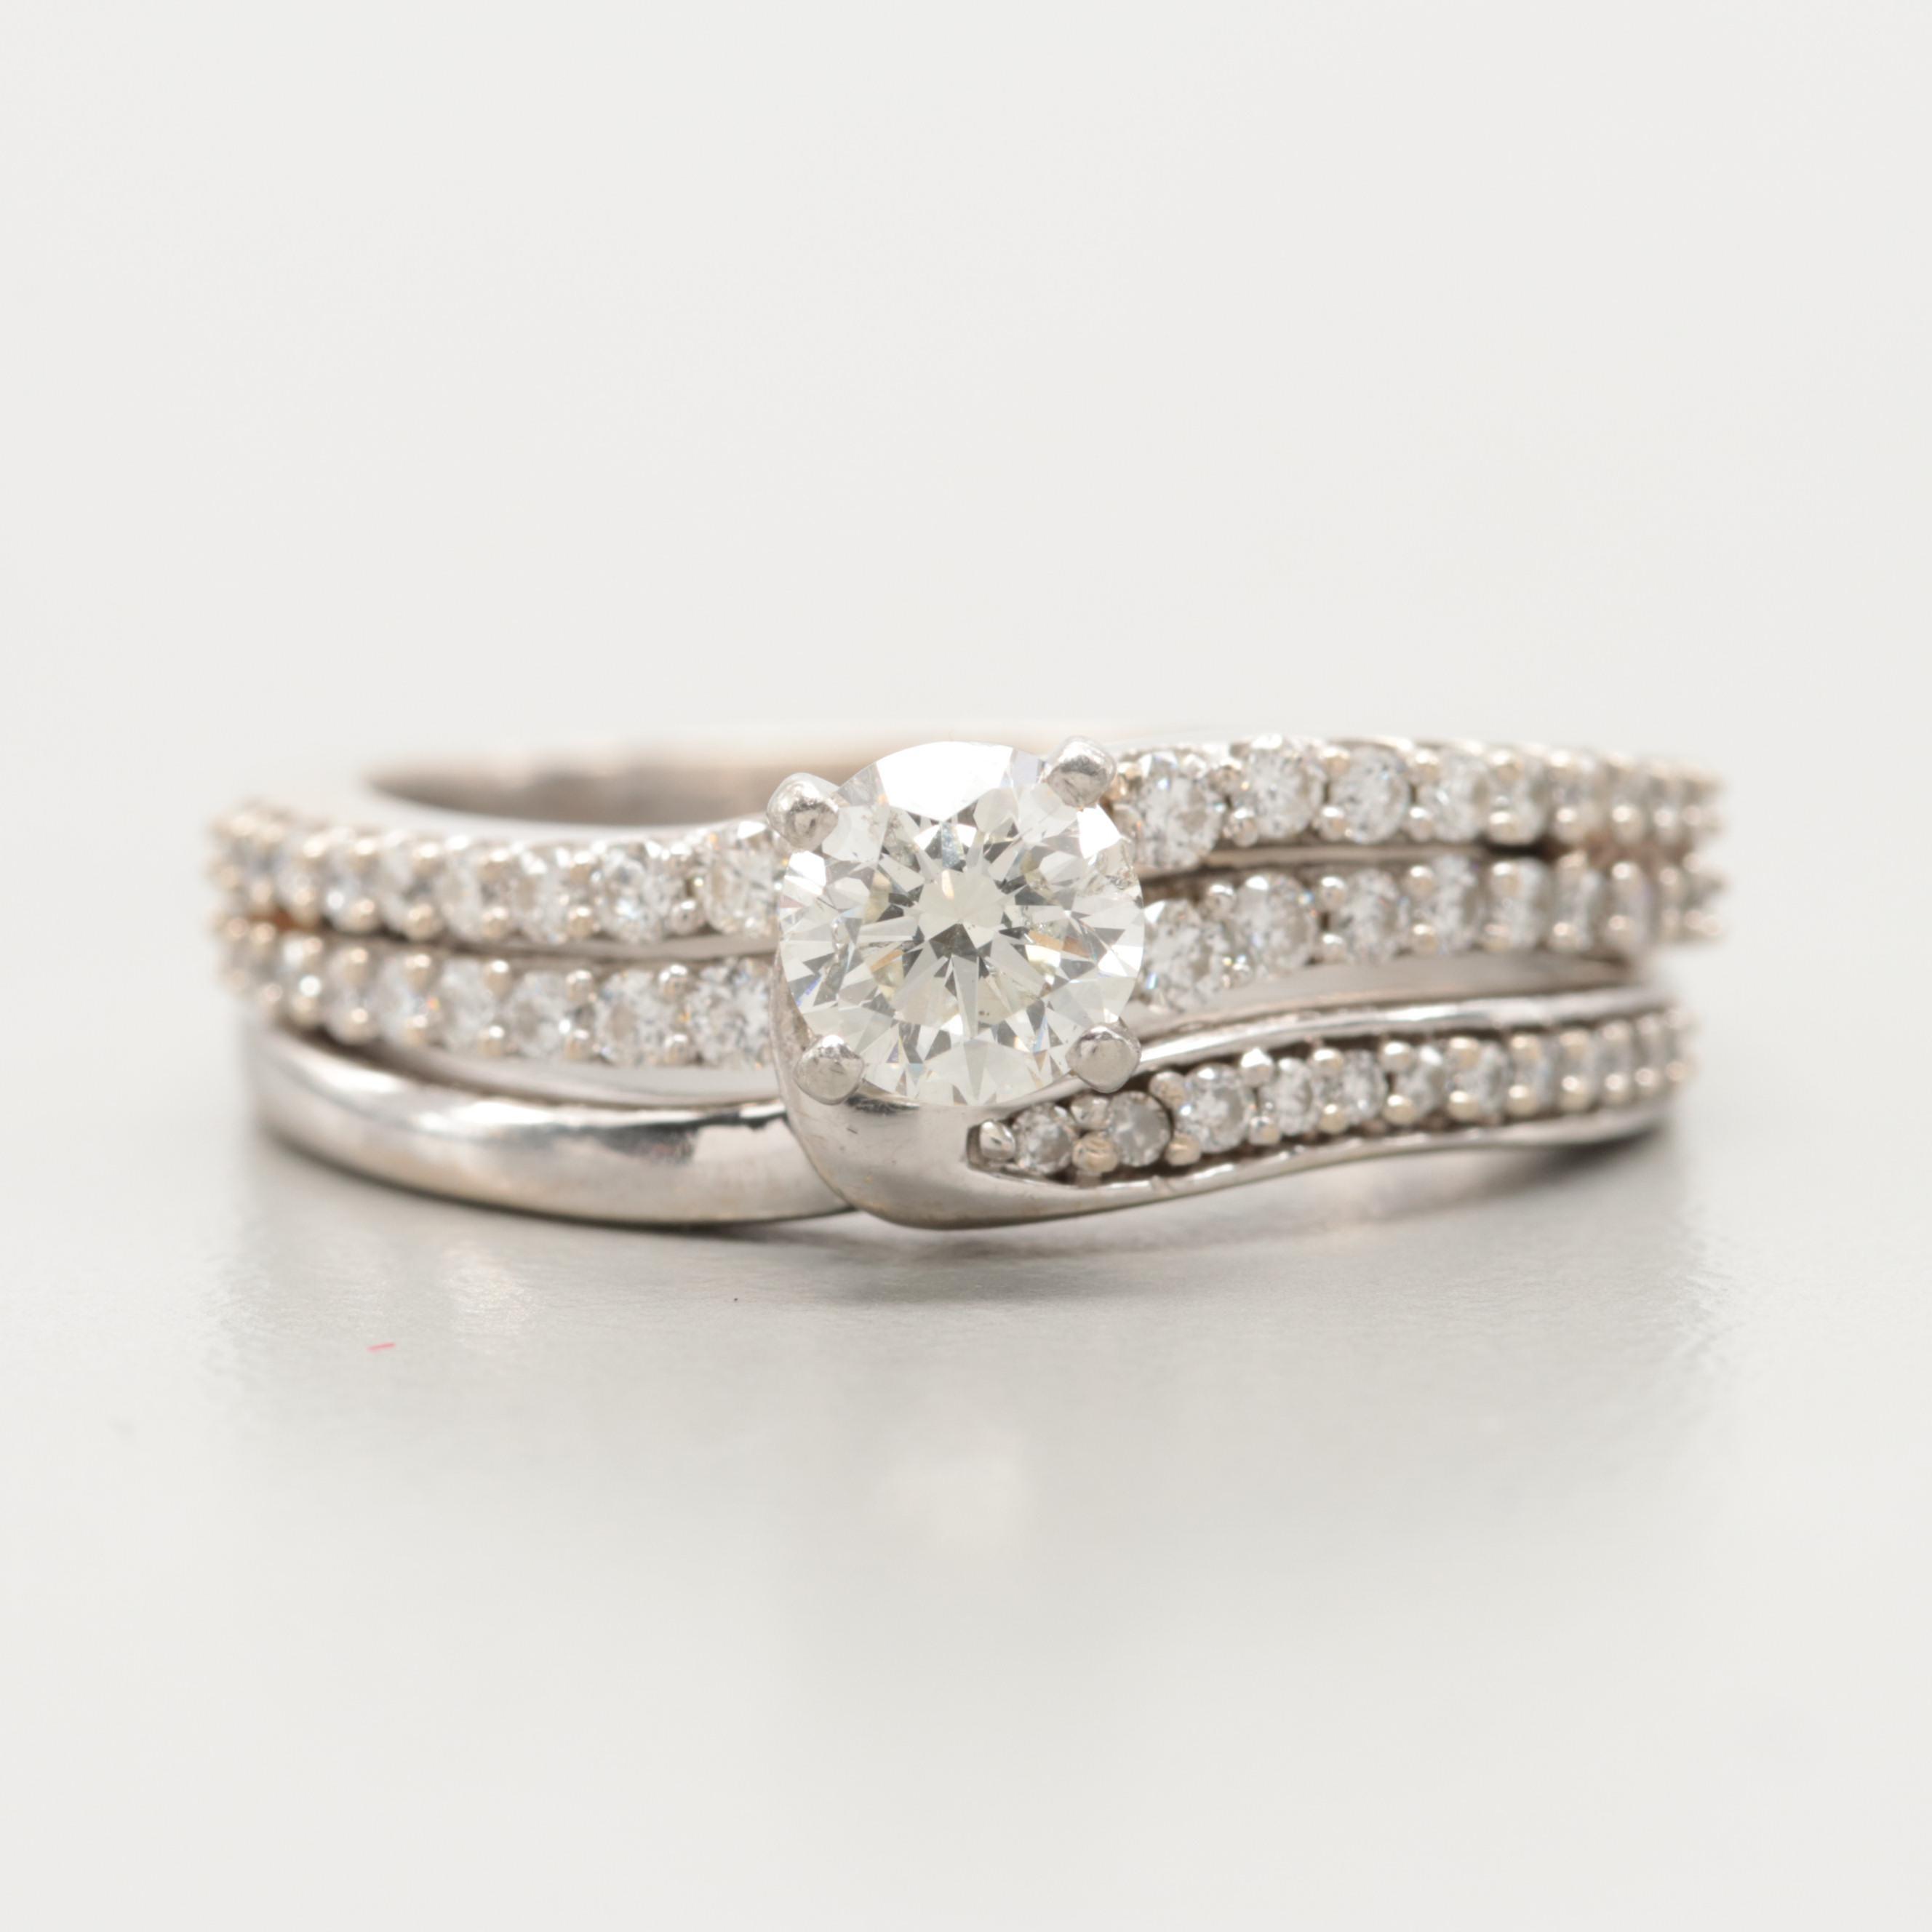 14K White Gold 1.15 CTW Diamond Ring Set